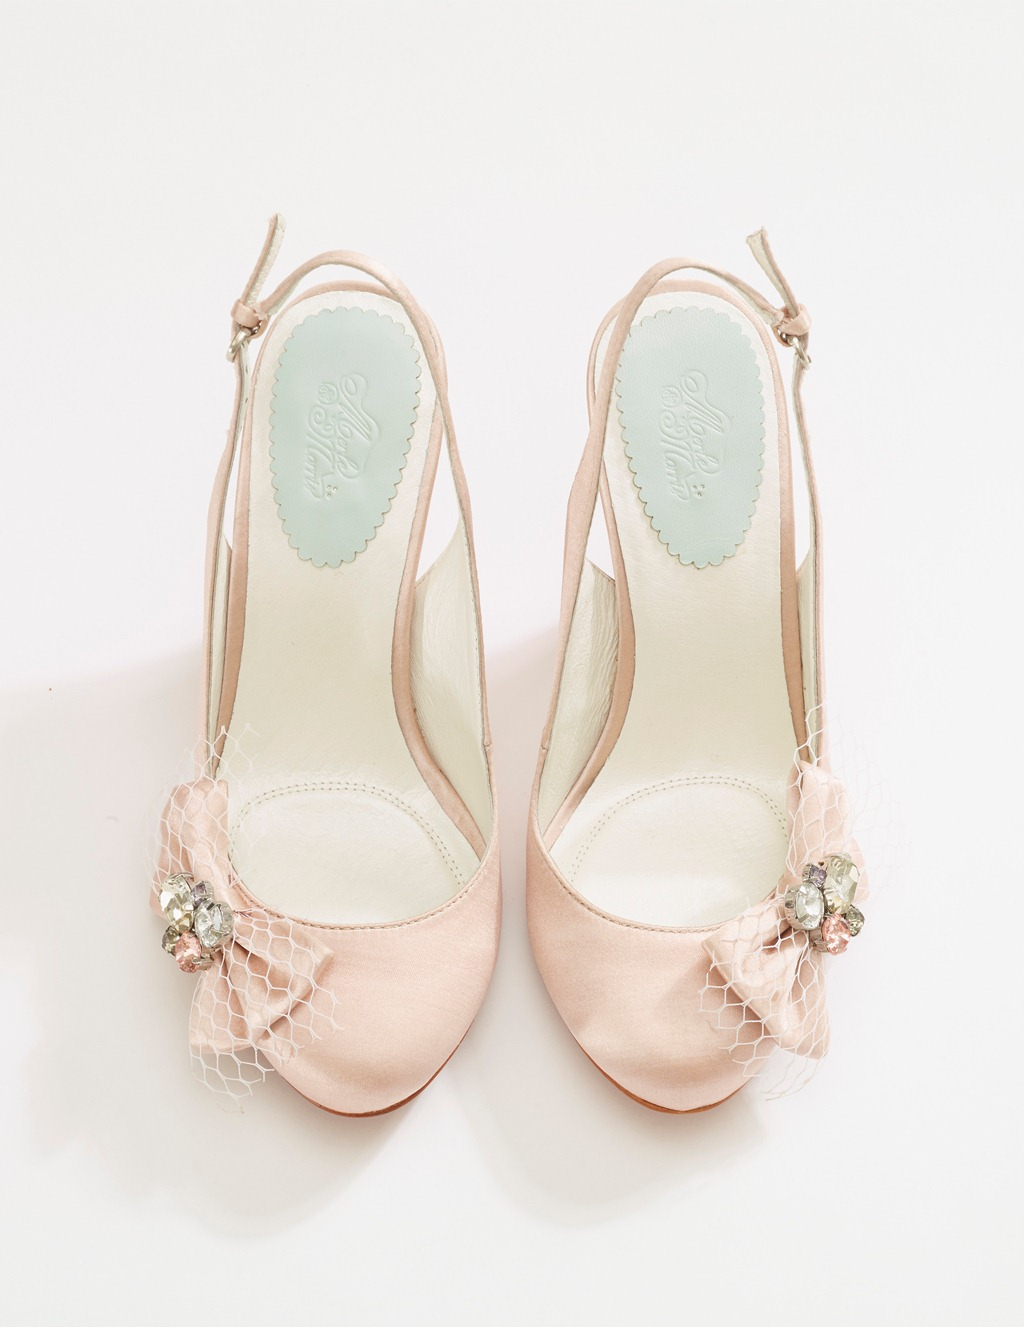 Beautiful Bridal Shoes from Merle & Morris - Iris